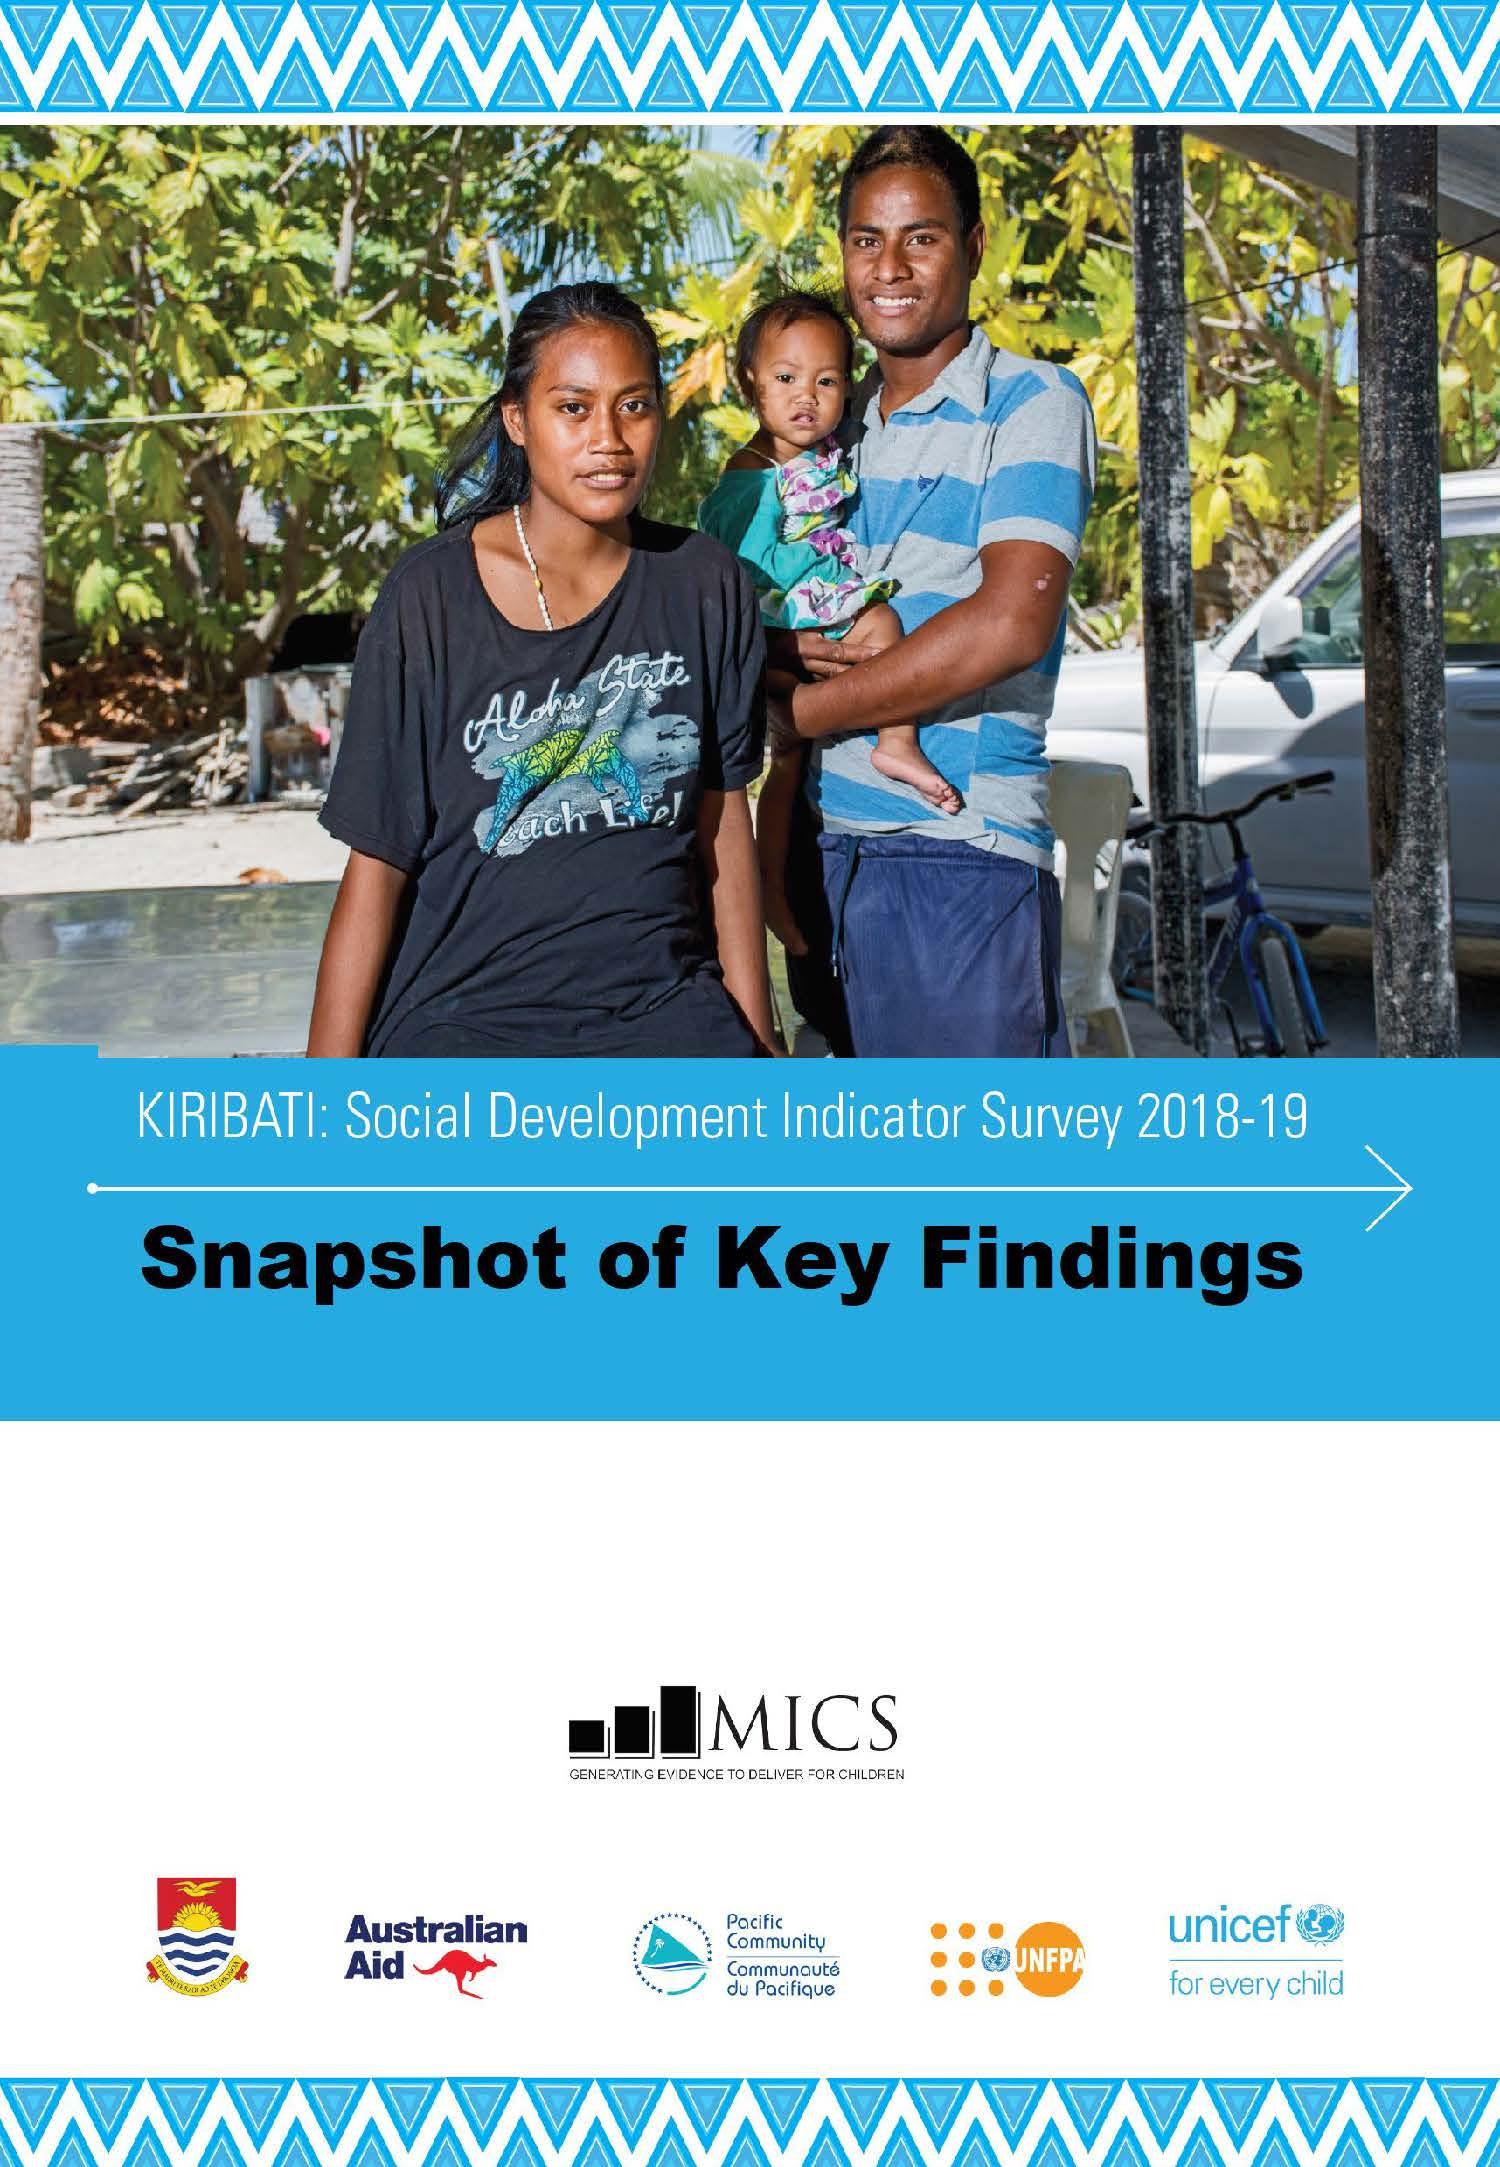 KIRIBATI: Social Development Indicator Survey 2019-19